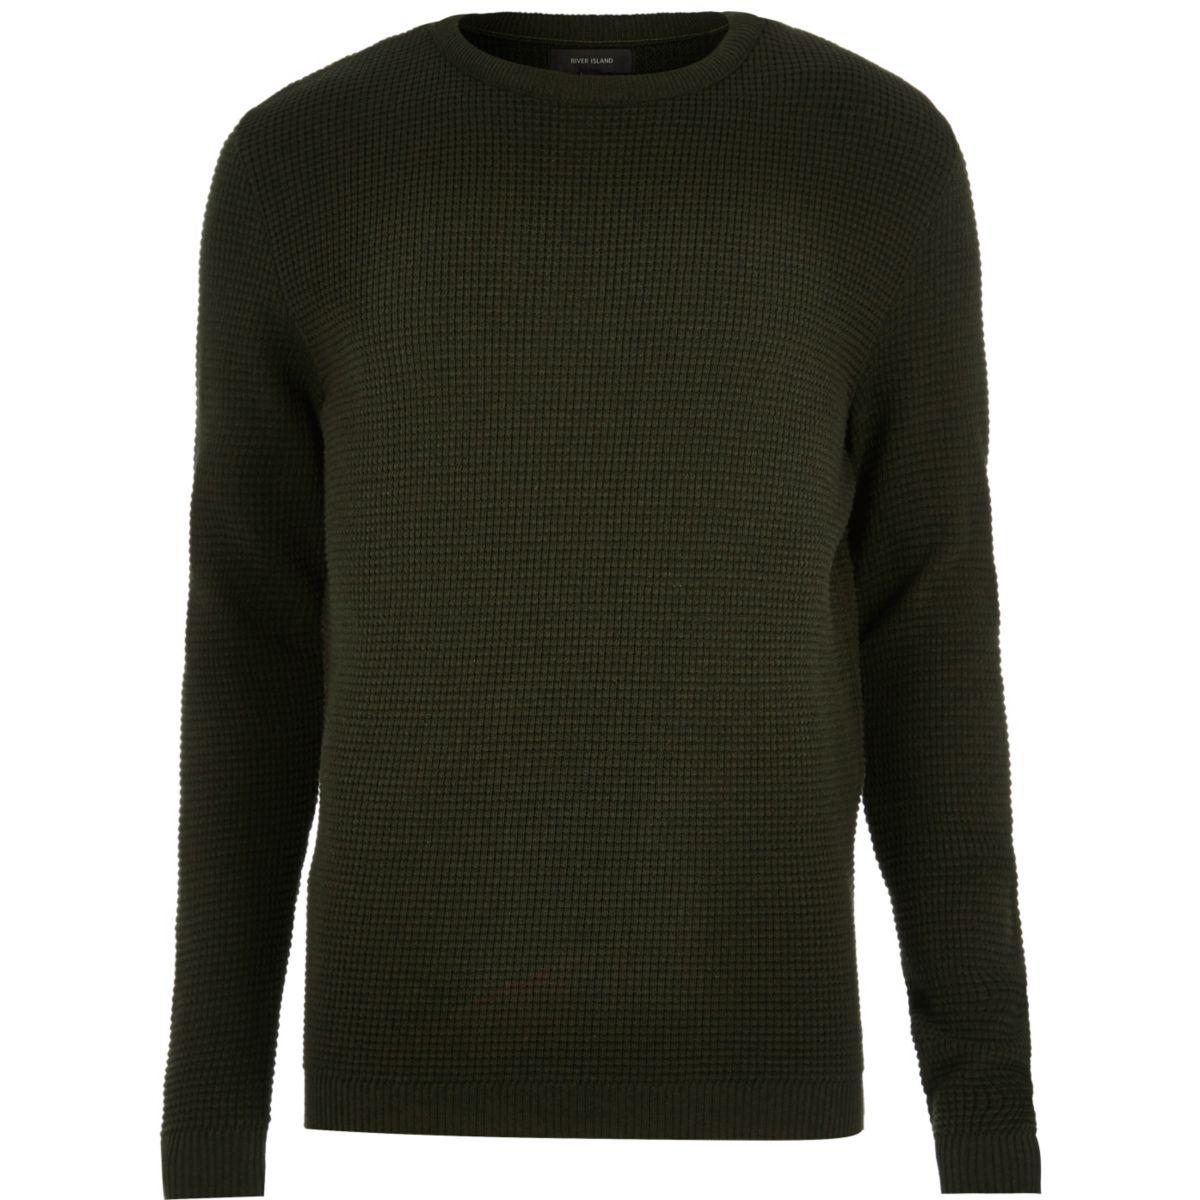 Dark khaki textured sweater